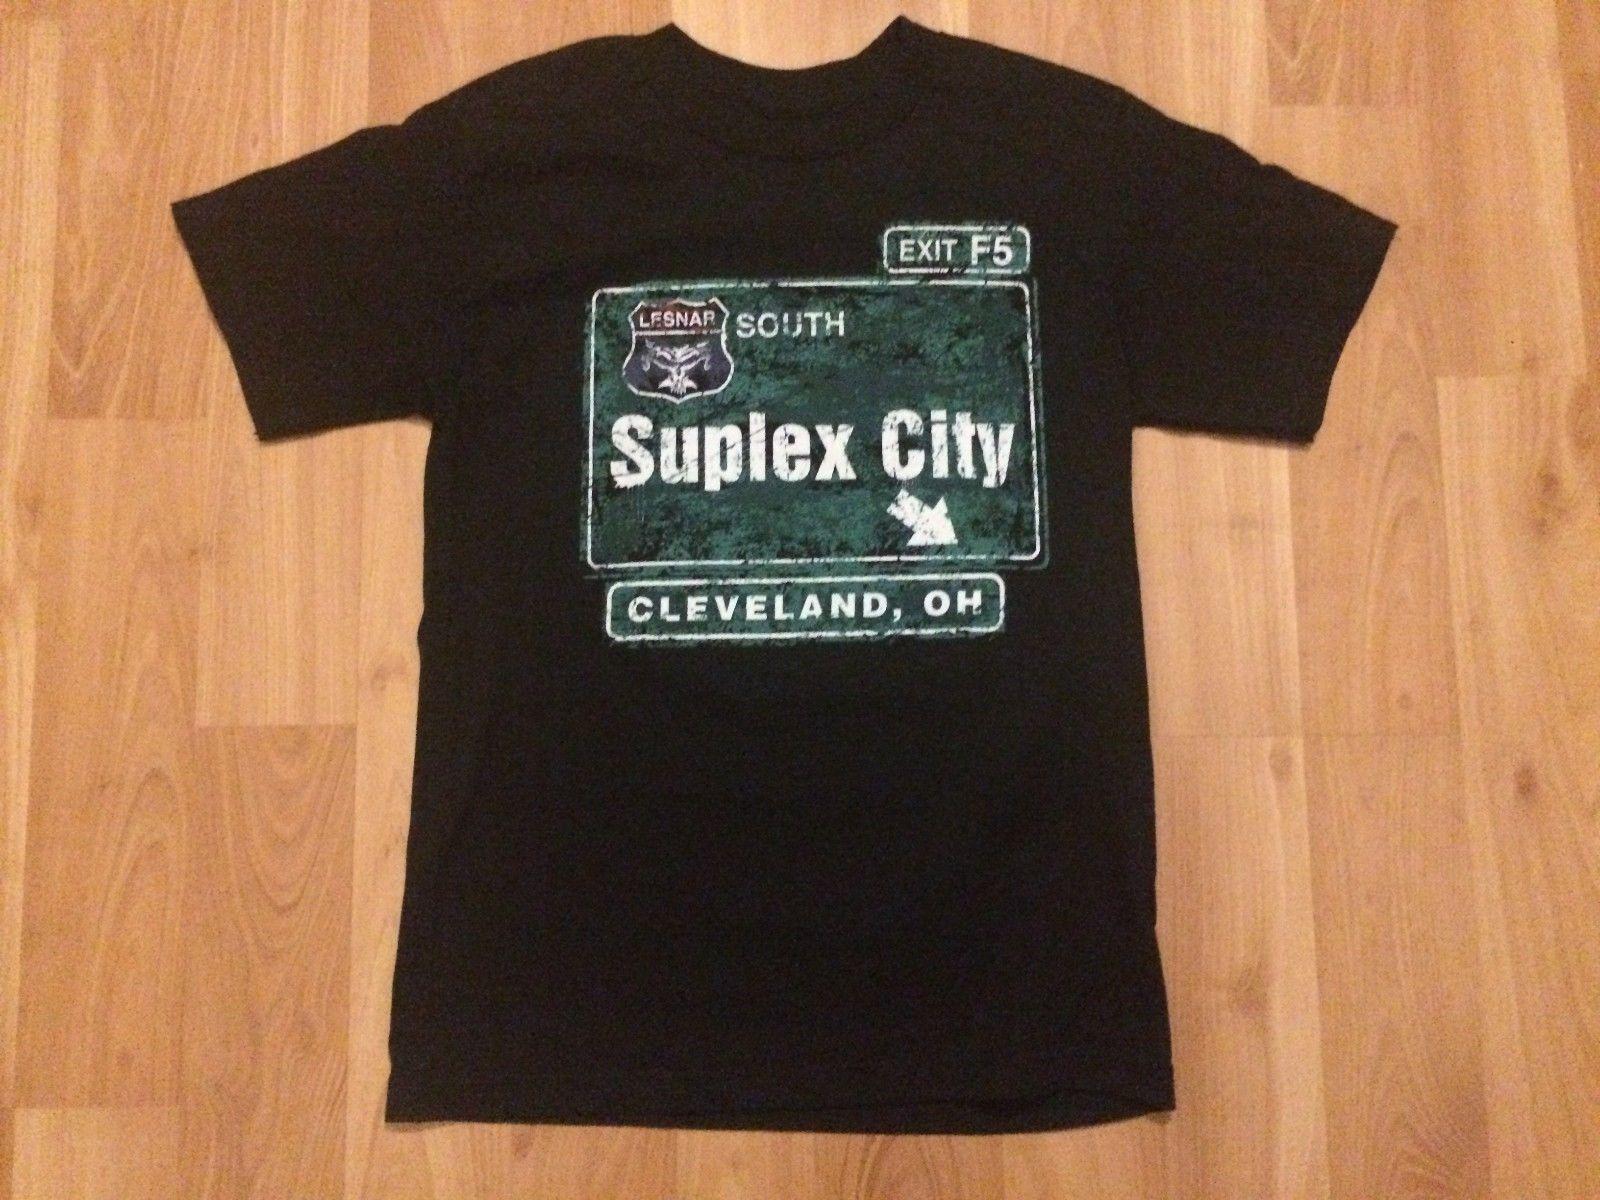 Lesnar Wew Acquista Brock City Suplex Cleveland T Small Mens Shirt xWdCreoB